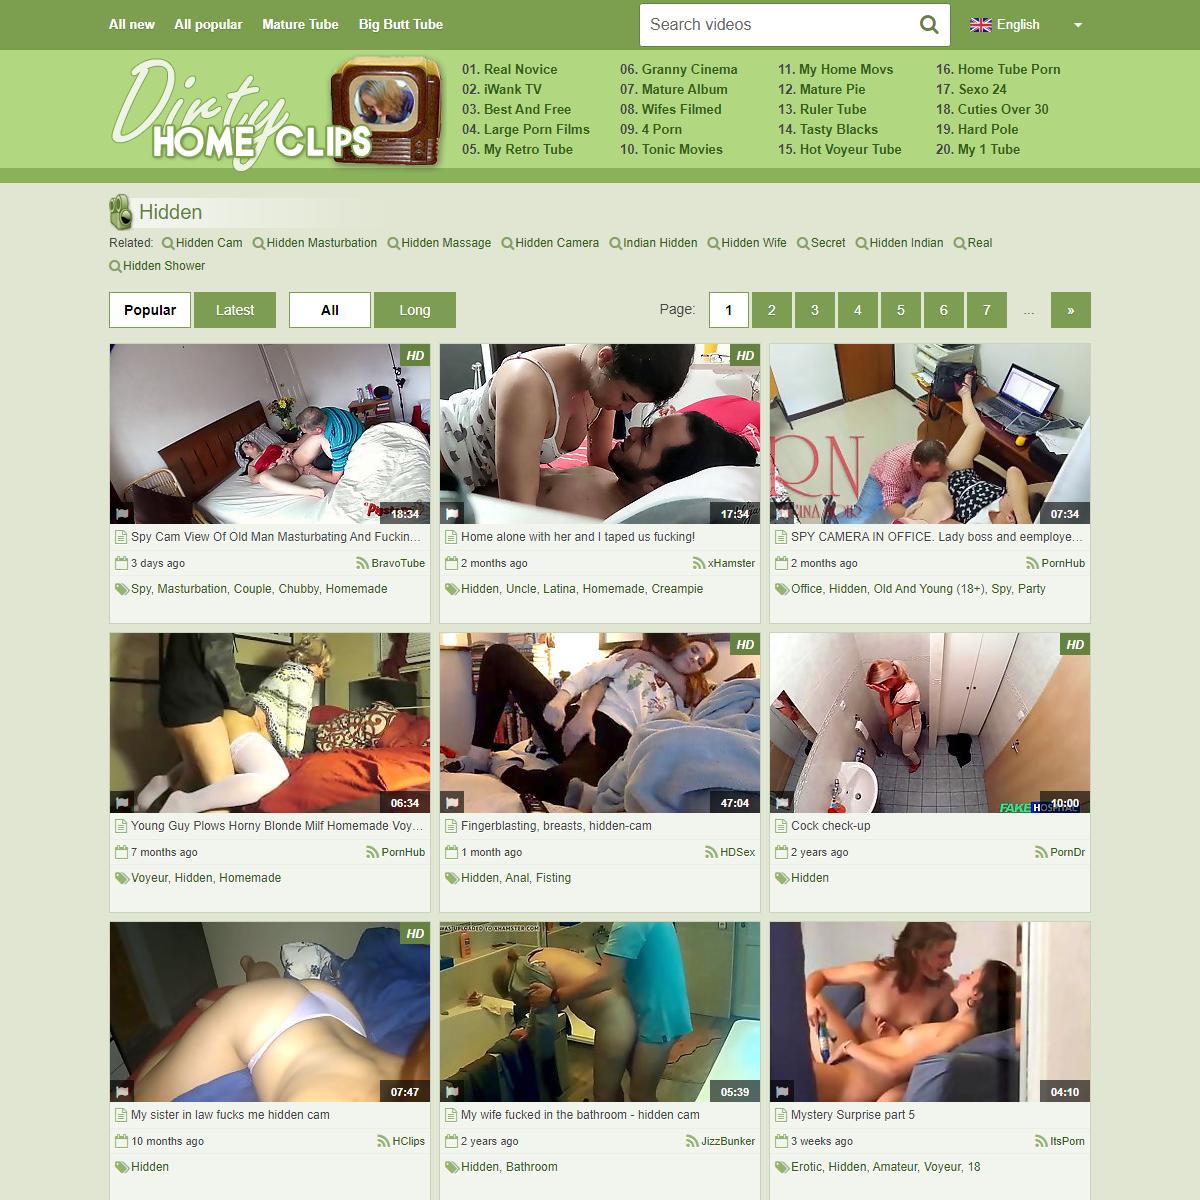 Hidden- 25948 videos. Dirty Home Clips.